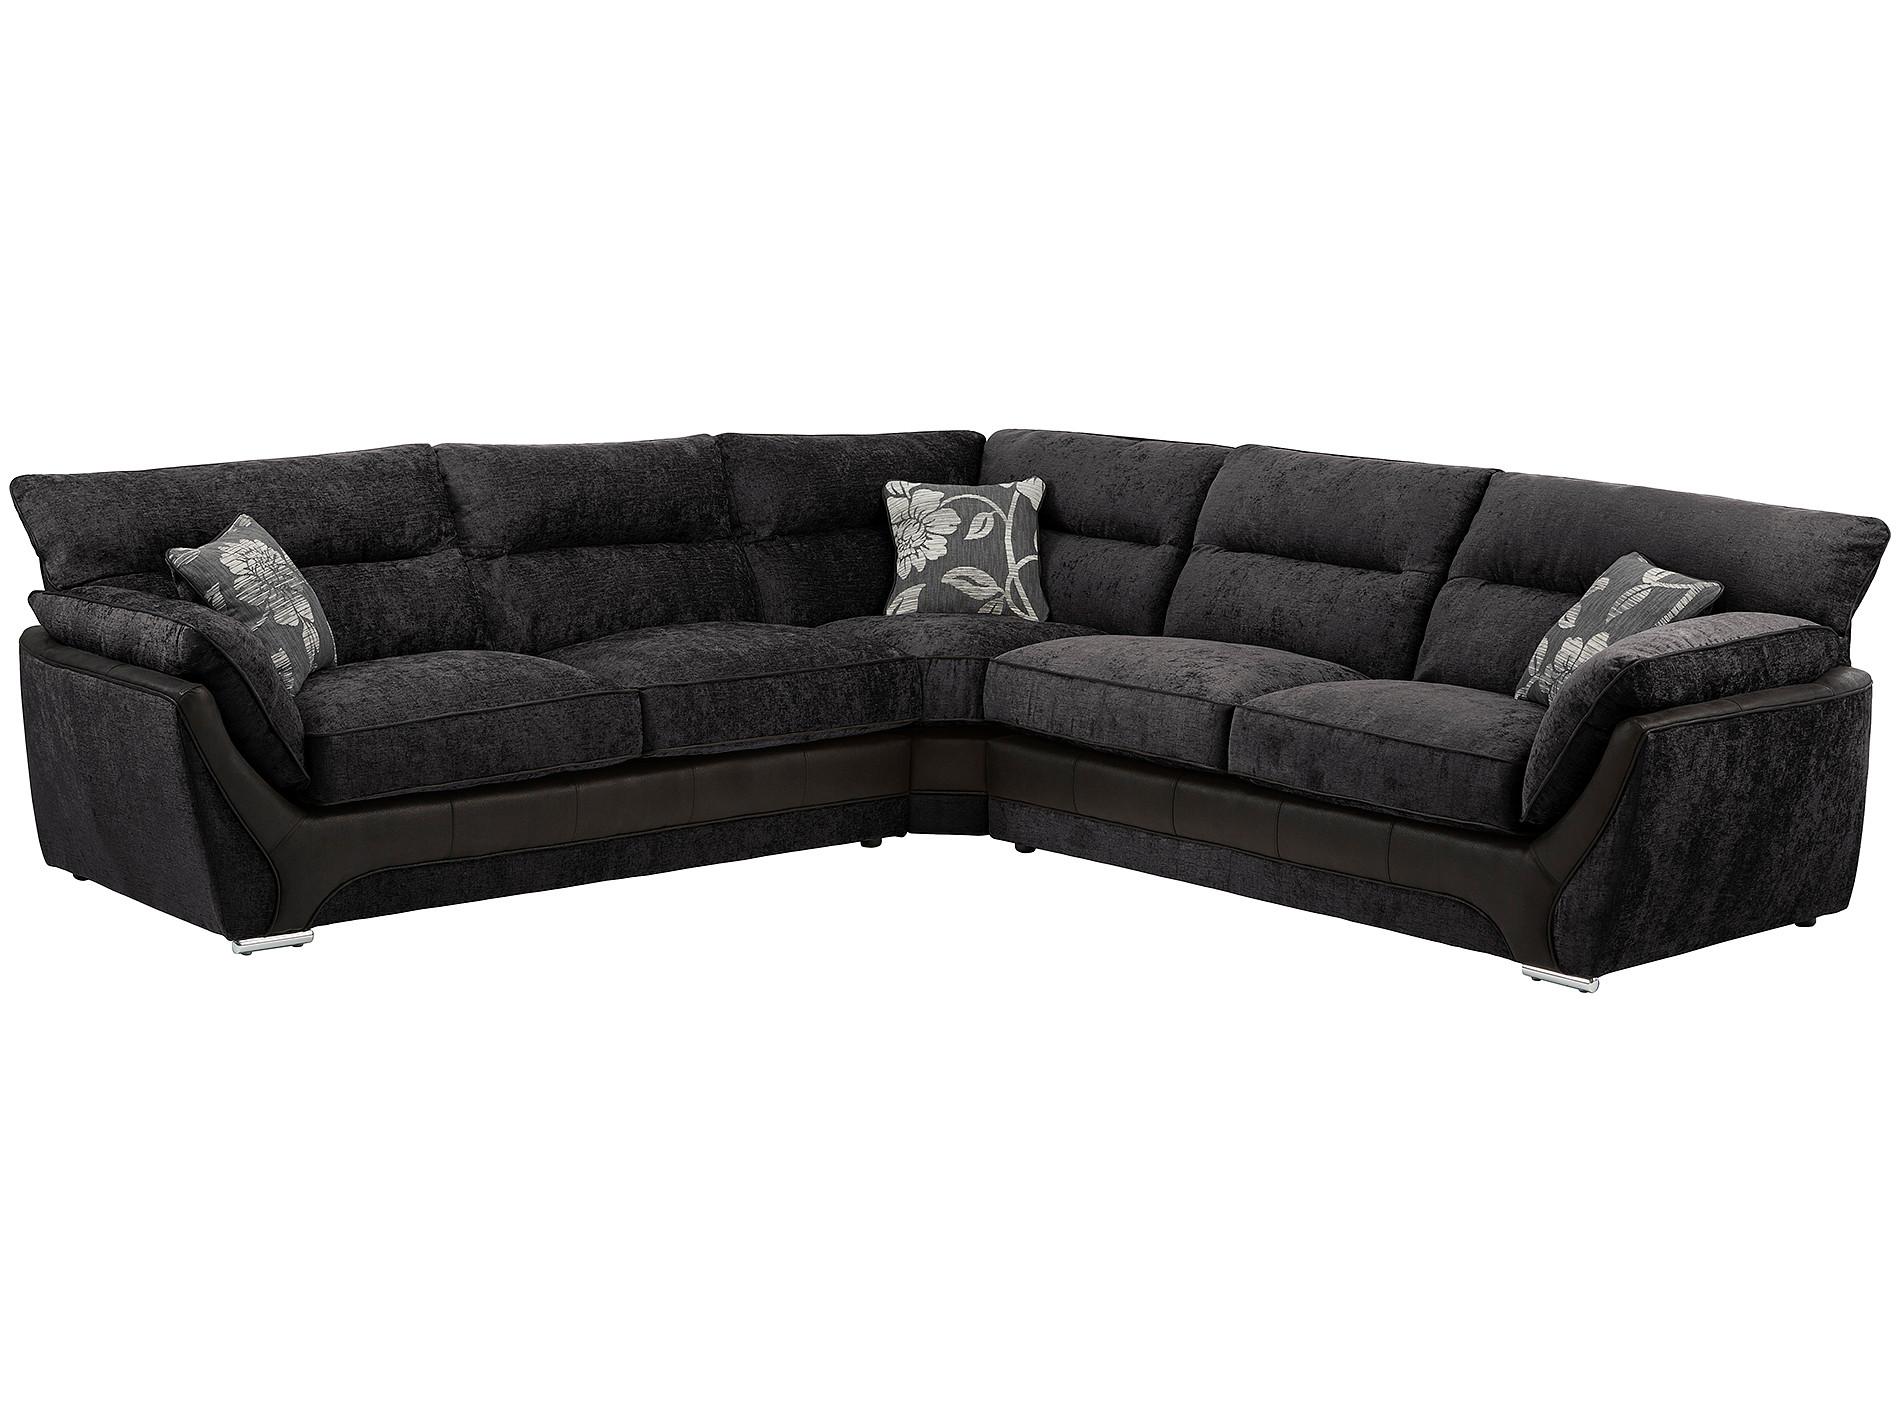 charcoal grey leather corner sofa good sets in chennai marla right hand elite